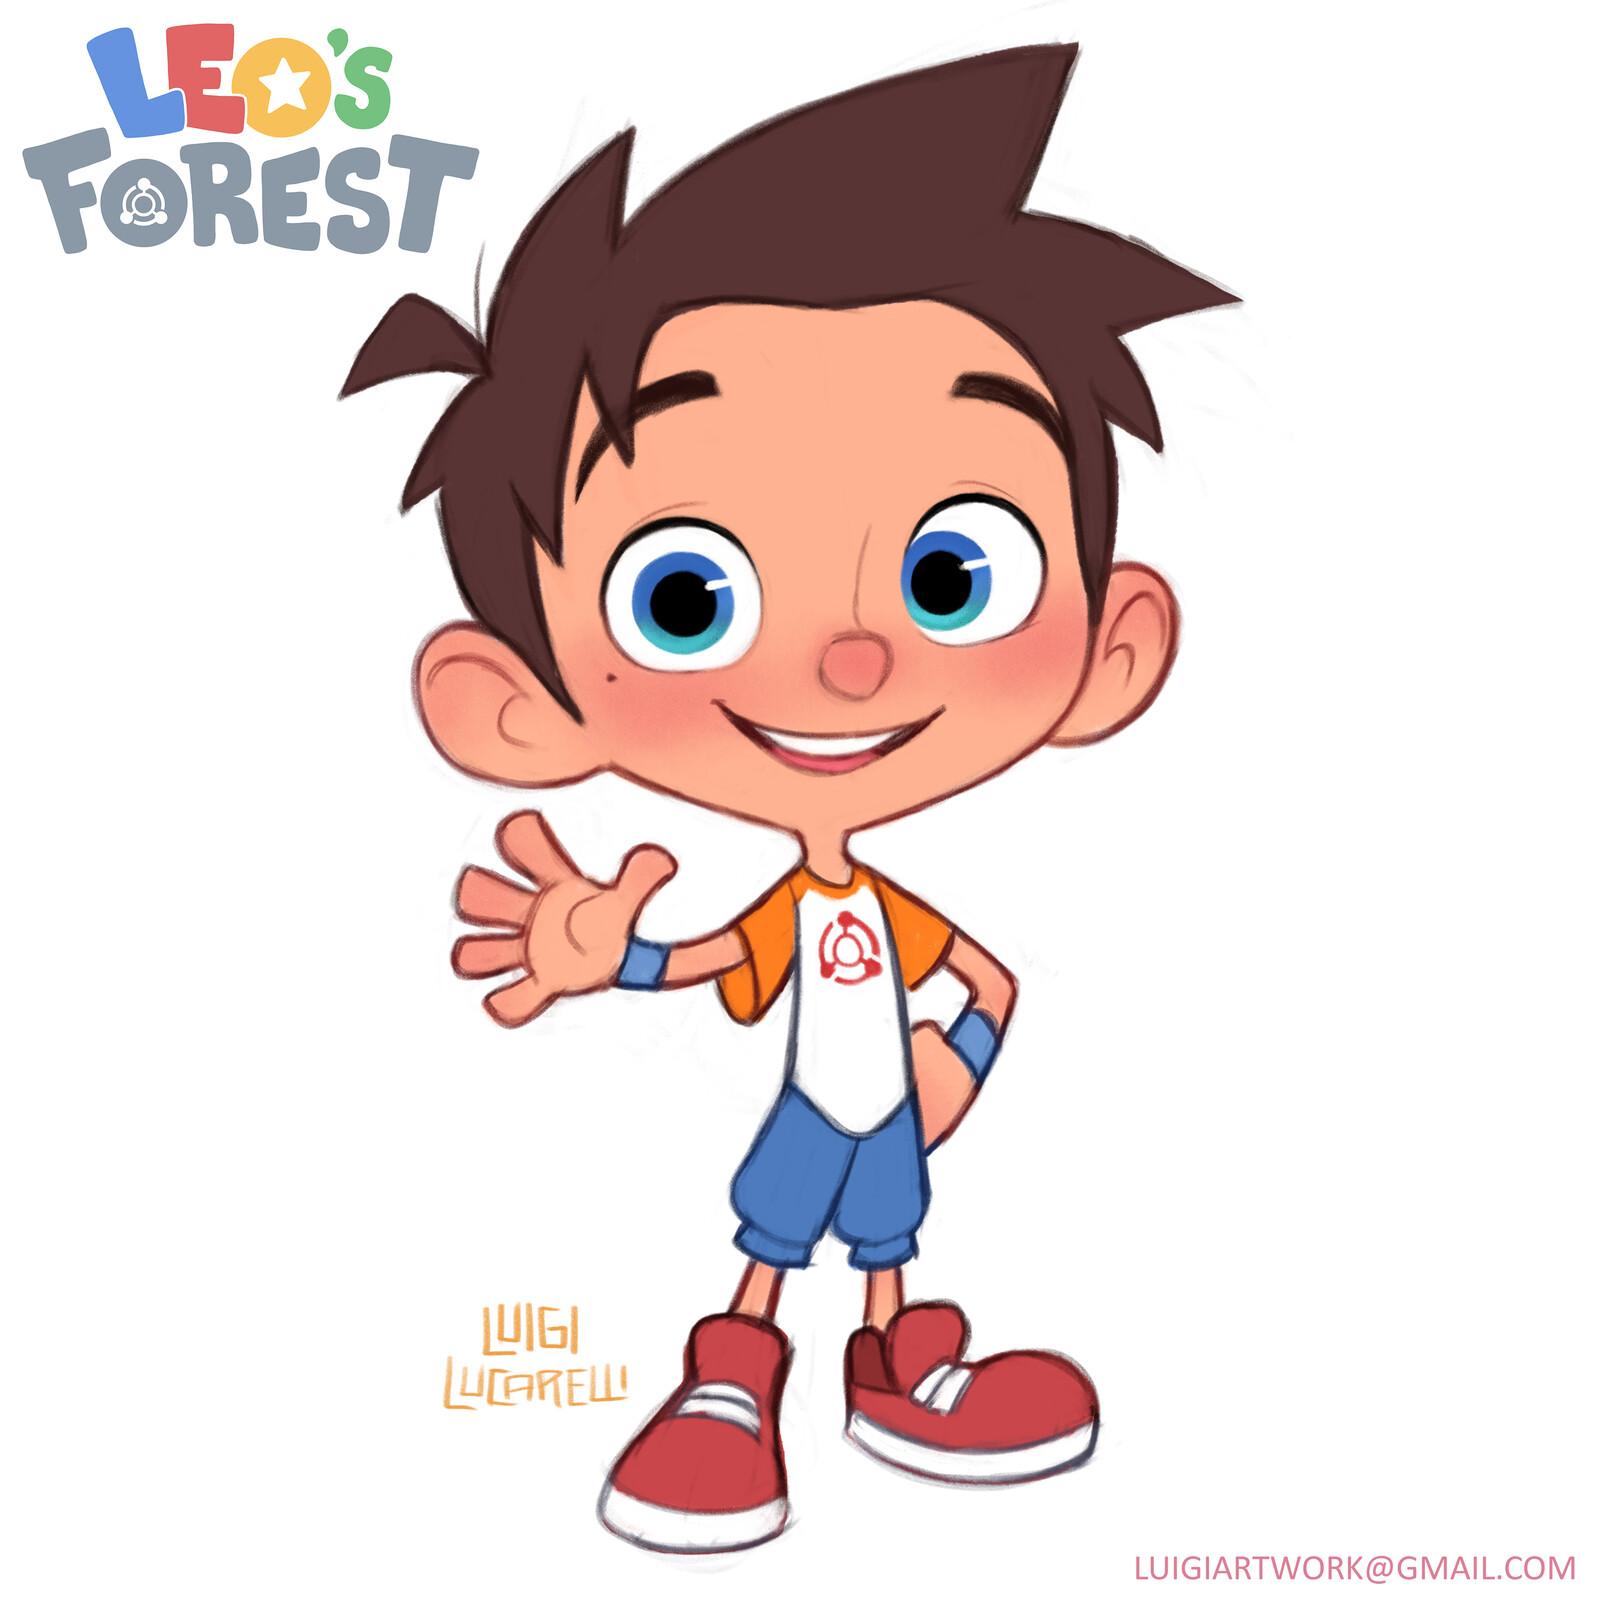 Leo's New Design!